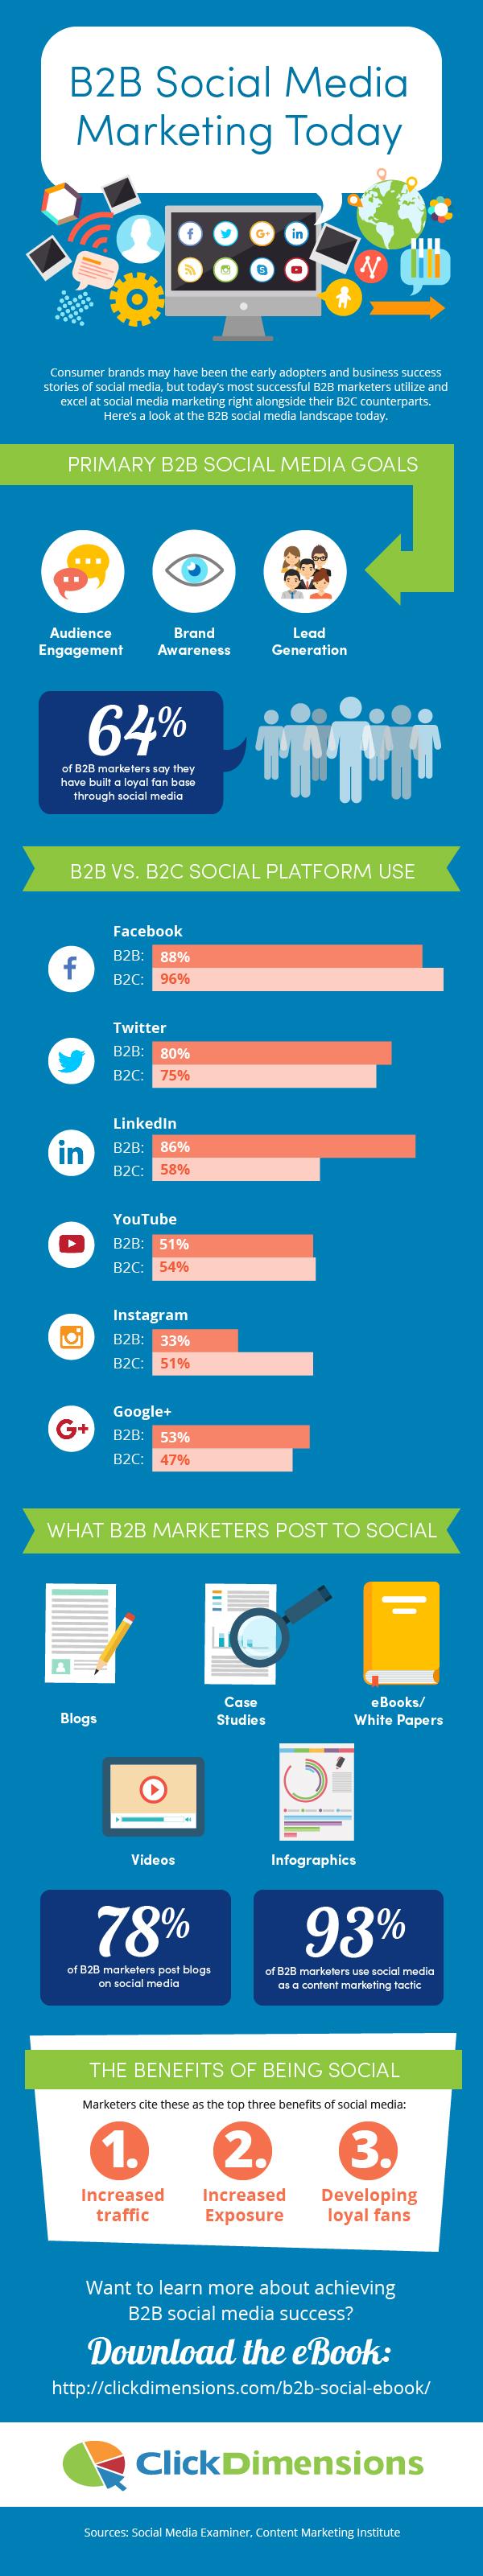 B2B Social Media Marketing Today #infographic